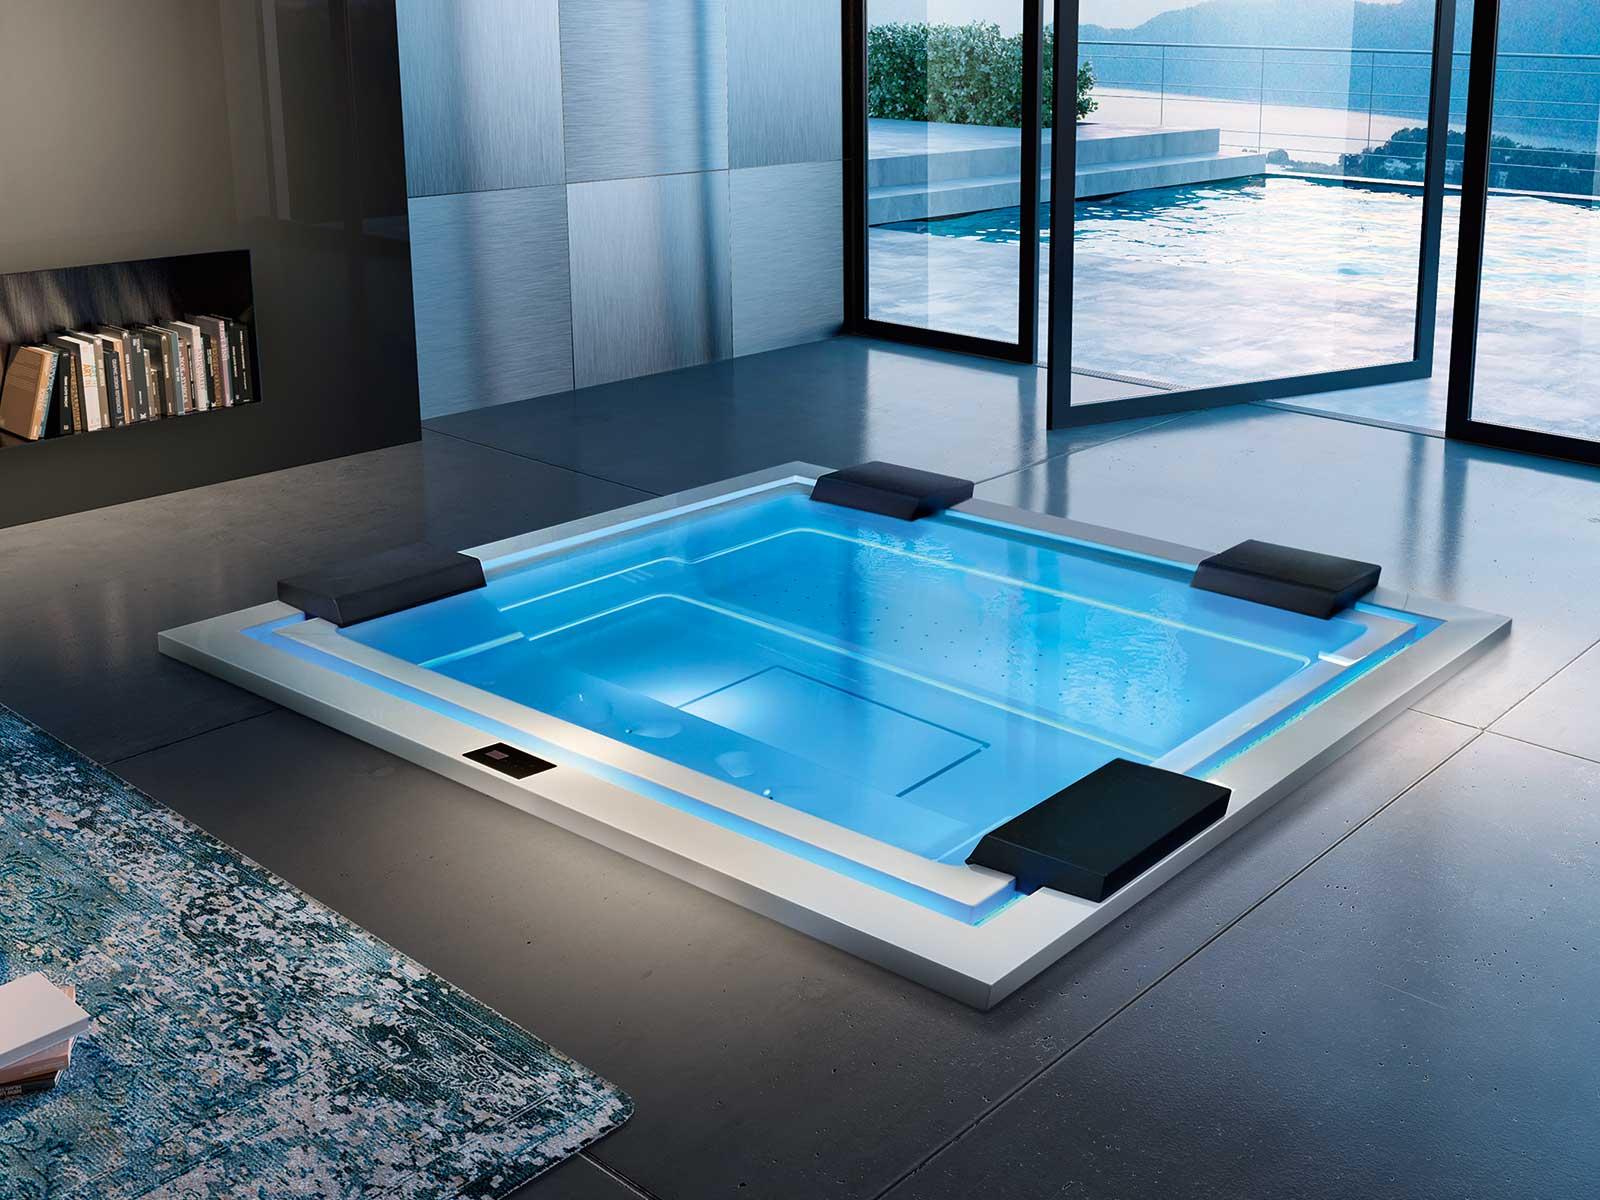 mini-pool-house-private-spa-xane